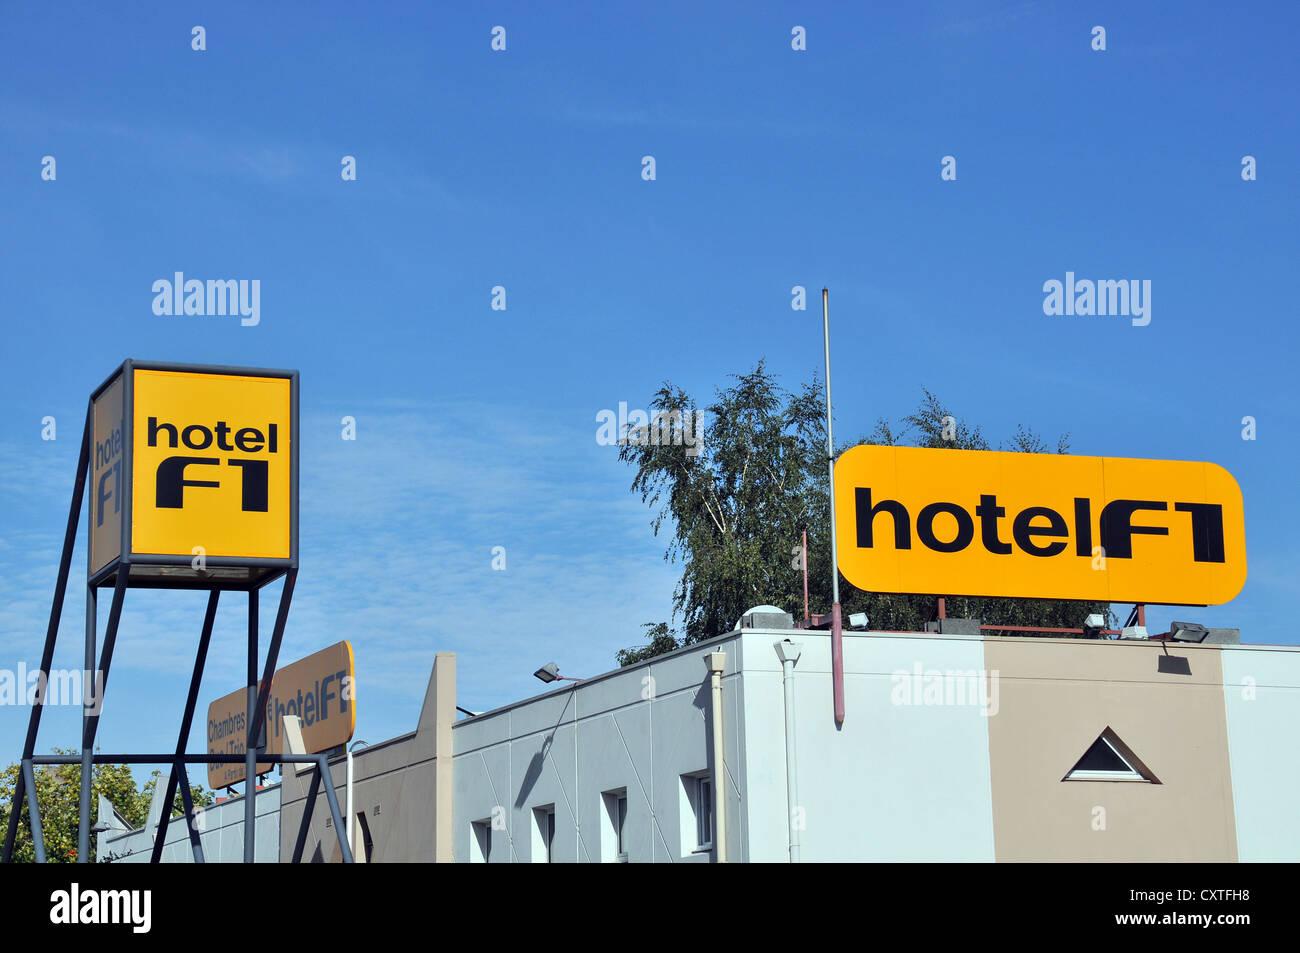 hotel F1 Coudes Auvergne Massif Central France - Stock Image